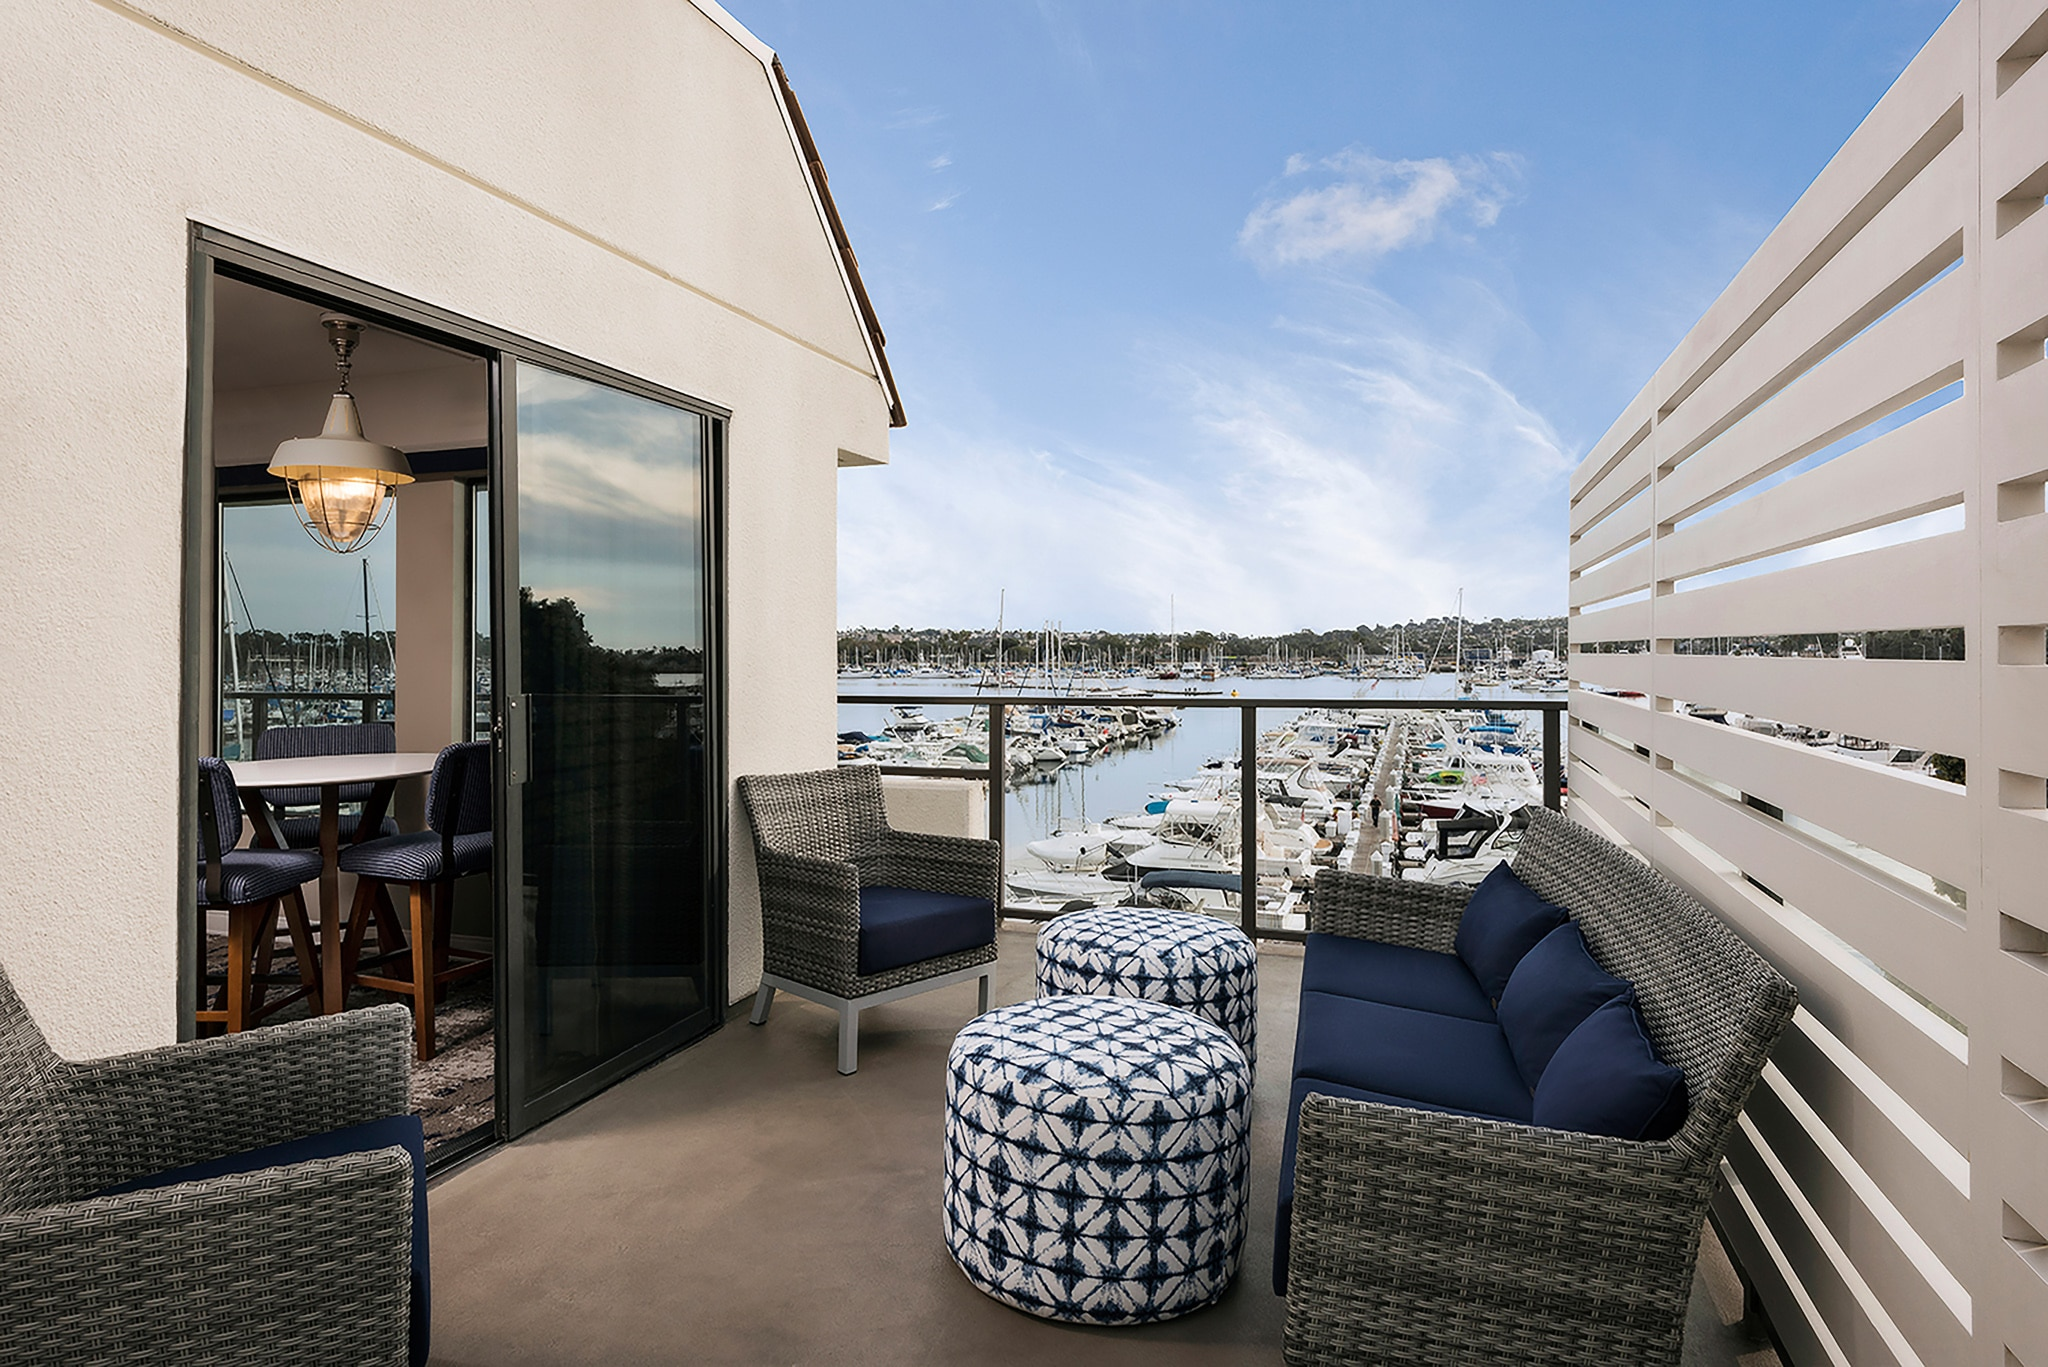 The Veranda Suite furnished balcony overlooking the marina at Hyatt Regency Mission Bay.